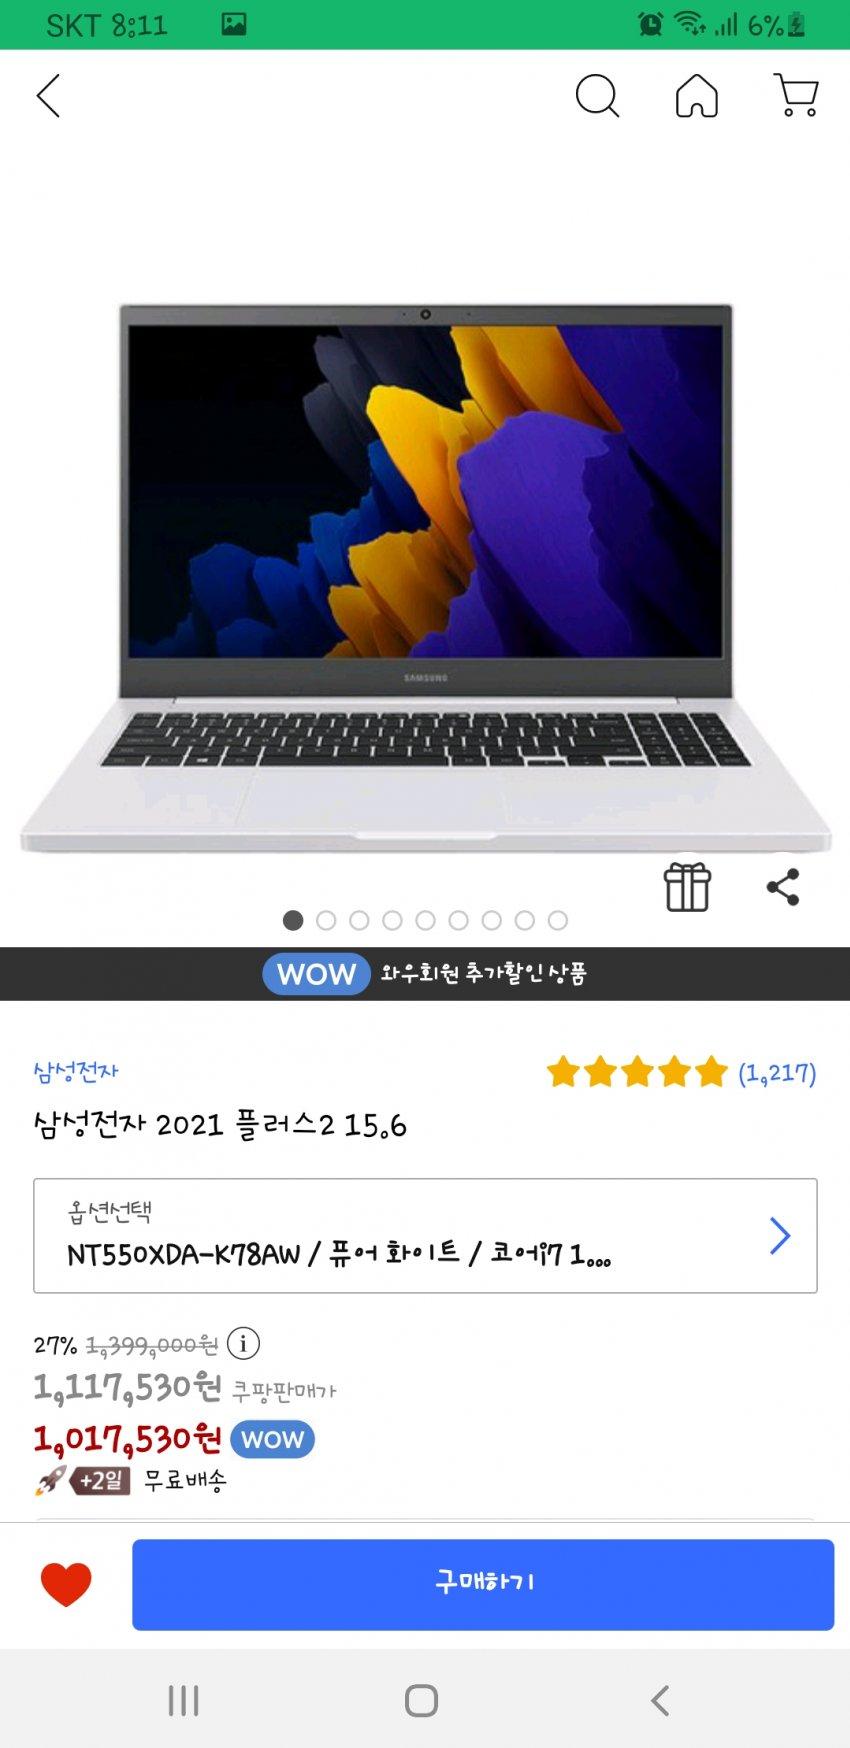 viewimage.php?id=3ebcdd35f0dc3fa1&no=24b0d769e1d32ca73dec8ffa11d02831046ced35d9c2bd23e7054e3c2d8867a810f9dc460acf4c51a24b3a67a763b18ca9732b616ea8ecd753283eebb584d7ba848cc3f2197738abf2f9d9add3cec1fbaef48eb4e58cd33bca4396da61